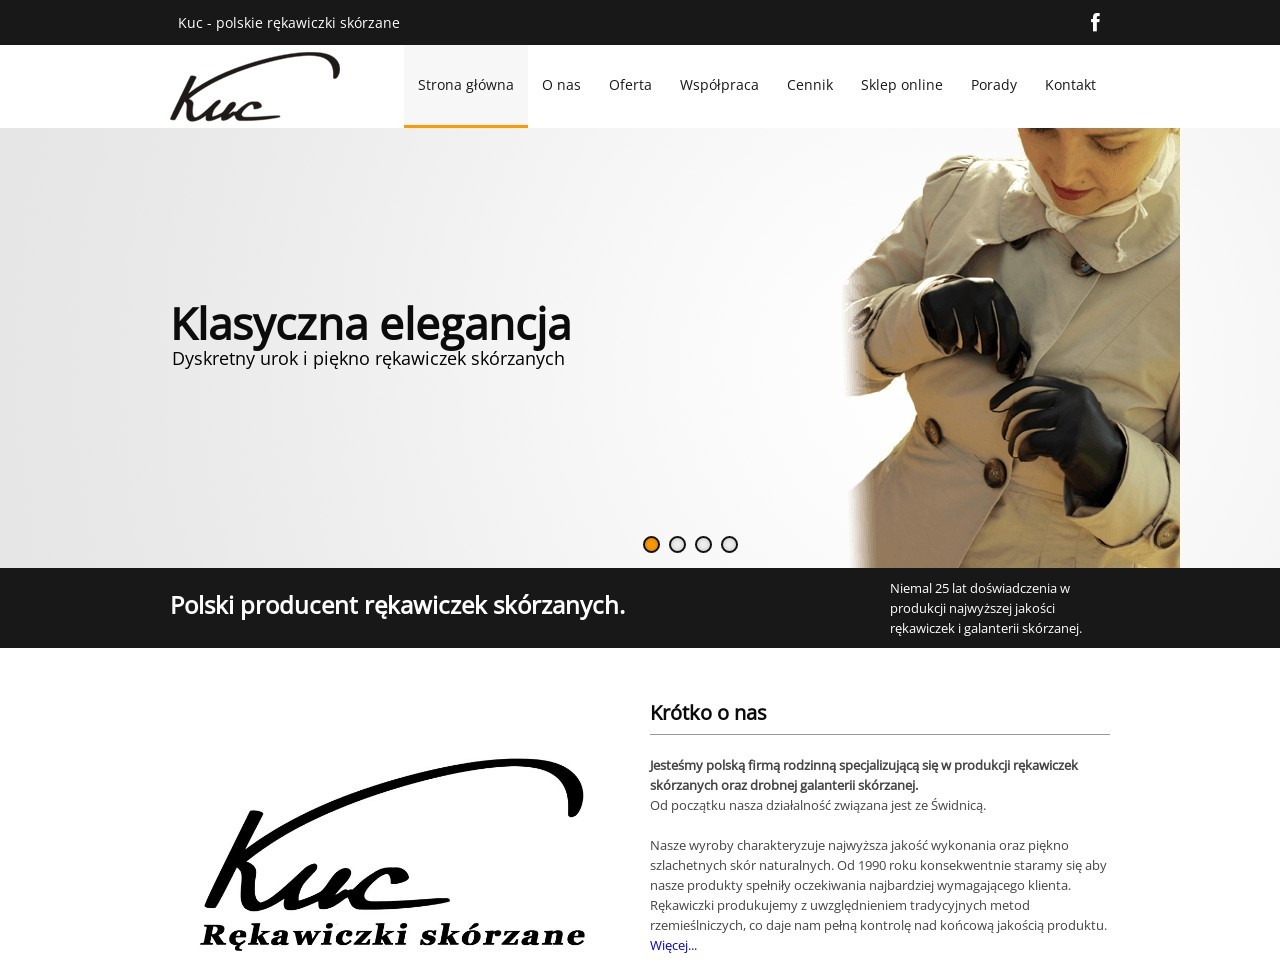 http://firmakuc.pl.nerdydata.com